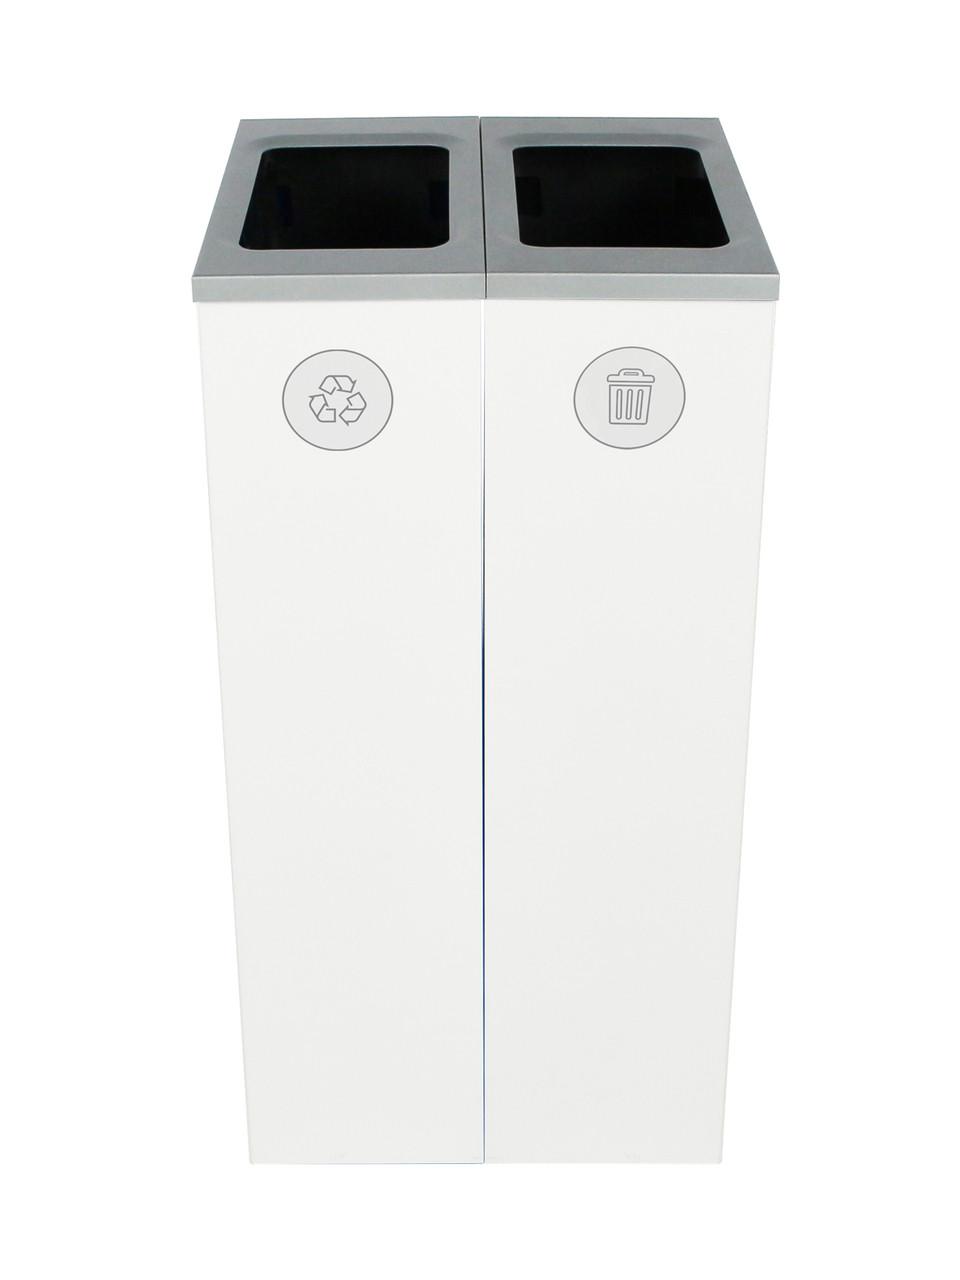 20 Gallon Spectrum Slim Dual Trash Can & Recycle Bin White 8107099-44